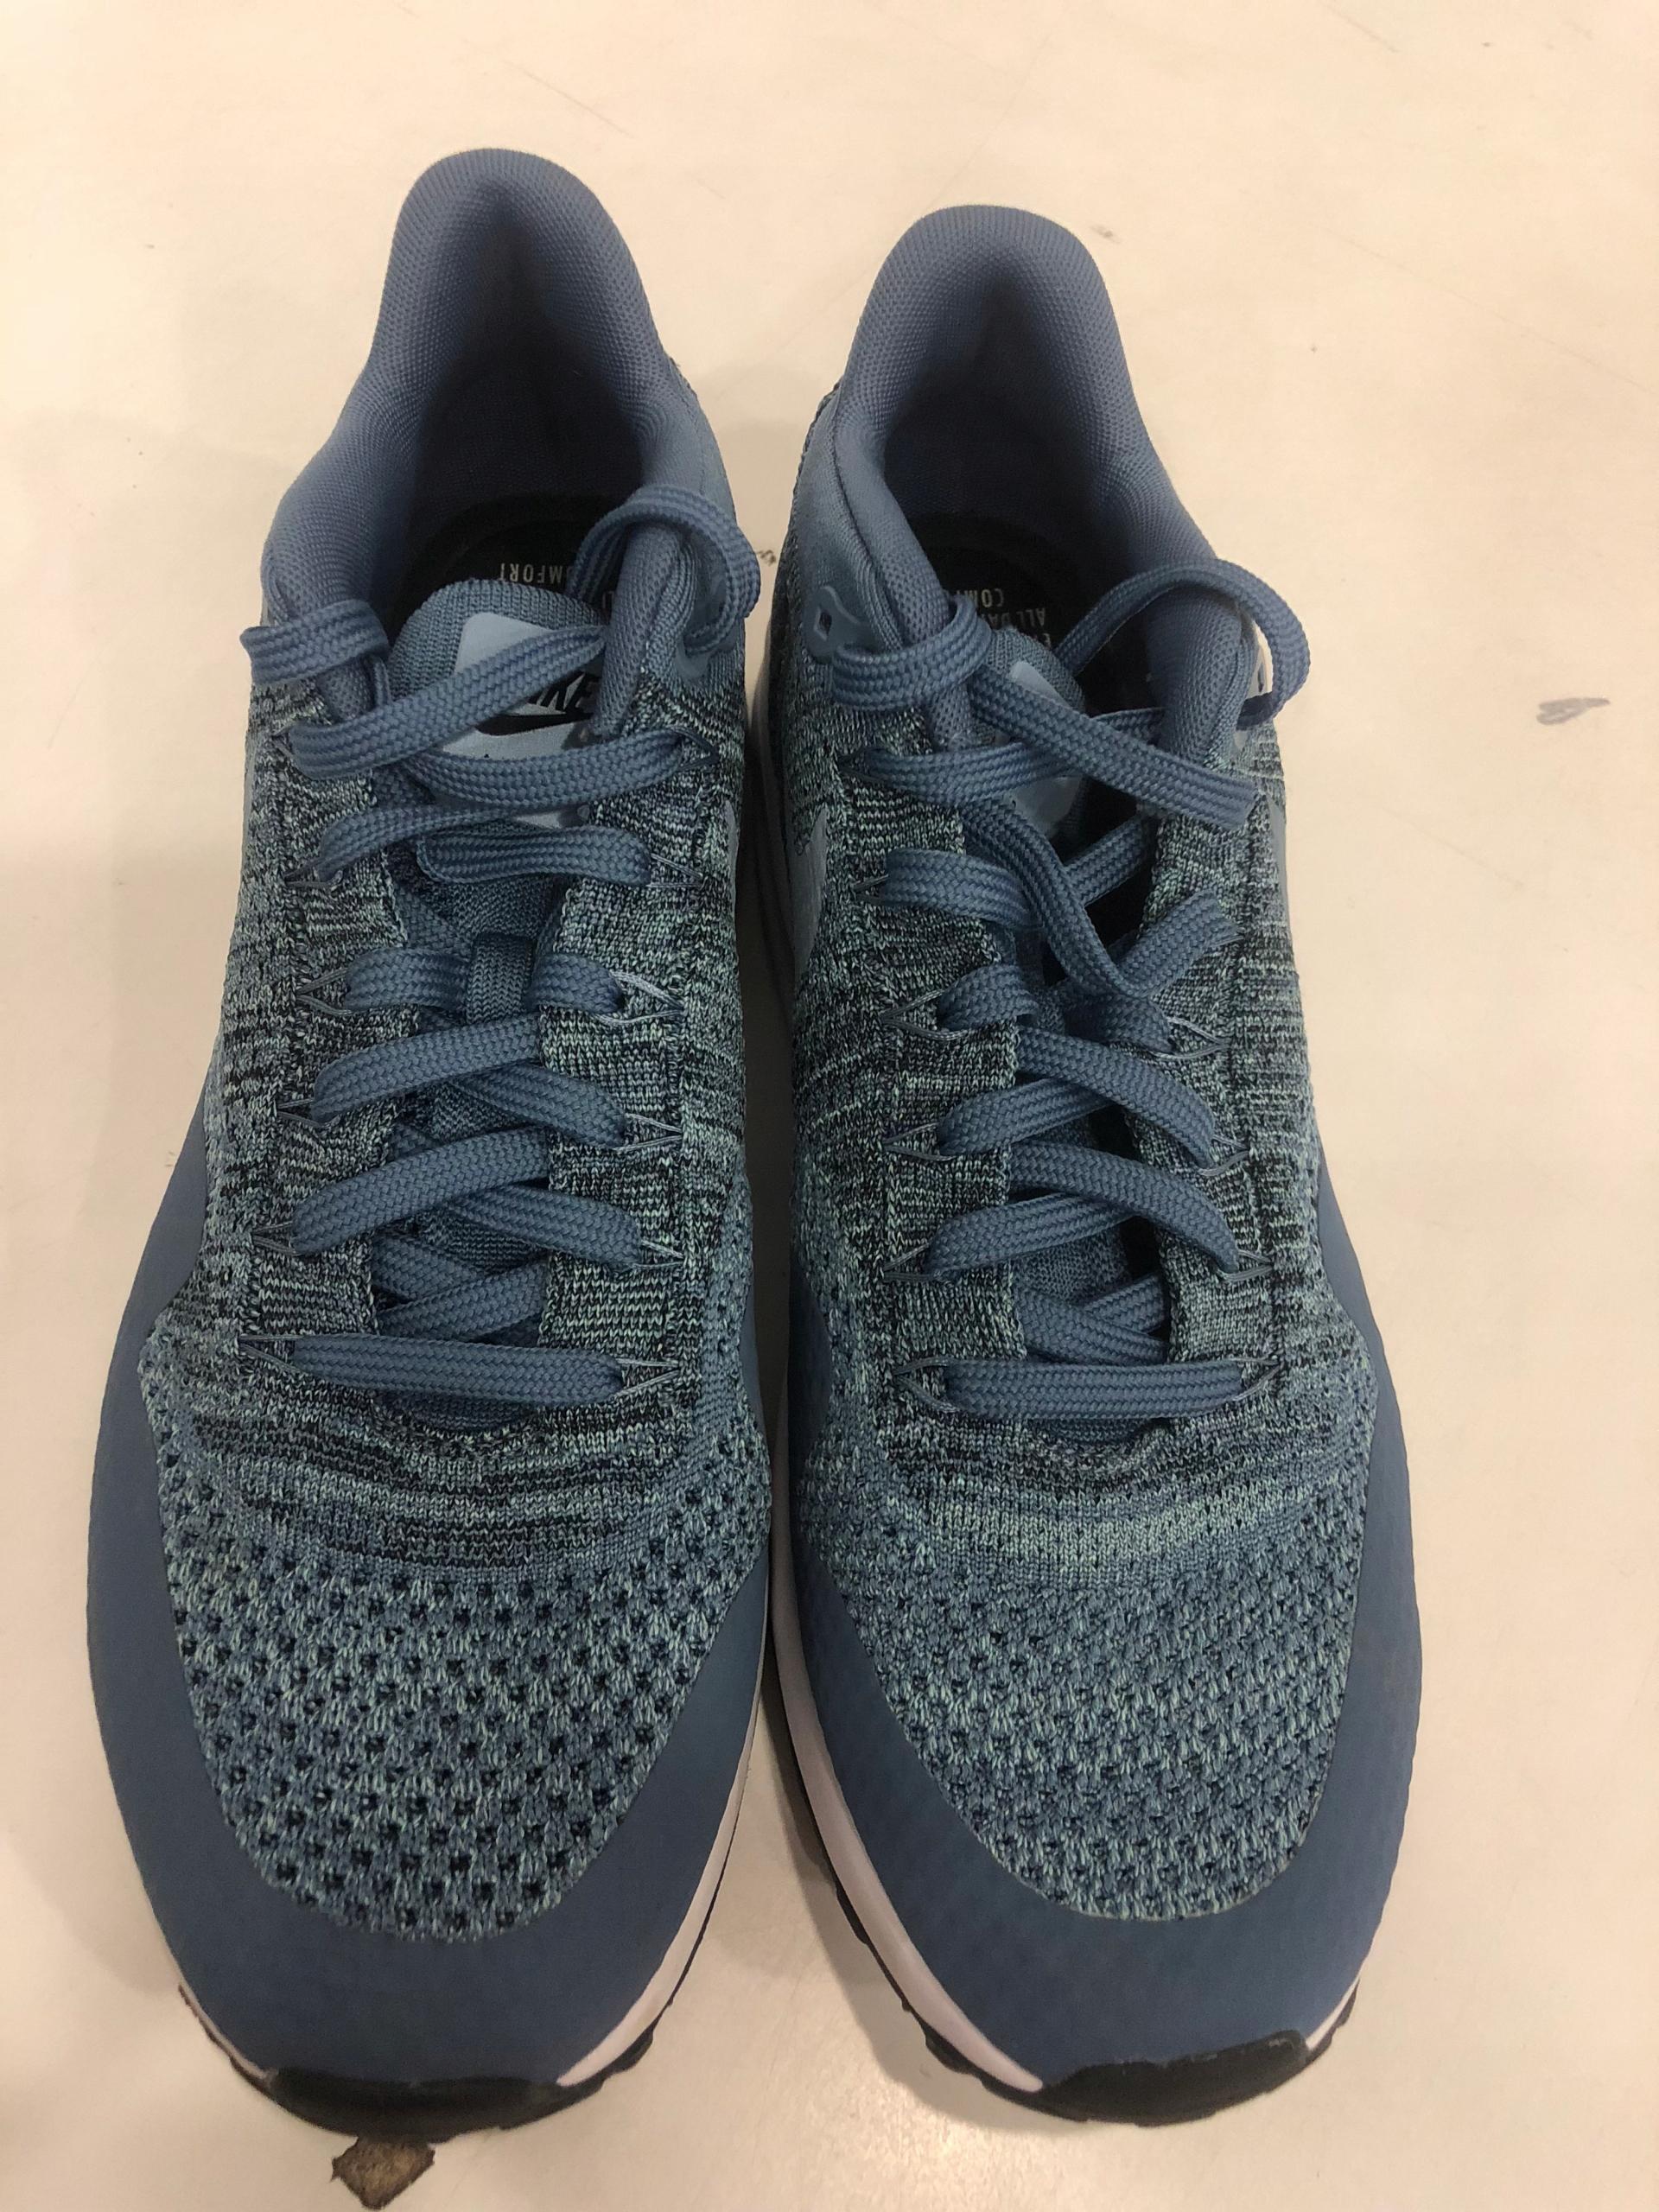 pick up e8849 80082 Buty Nike Air Max 1 Ultra 2.0 Flyknit R.46 UŻYWANE - 7484980989 ...